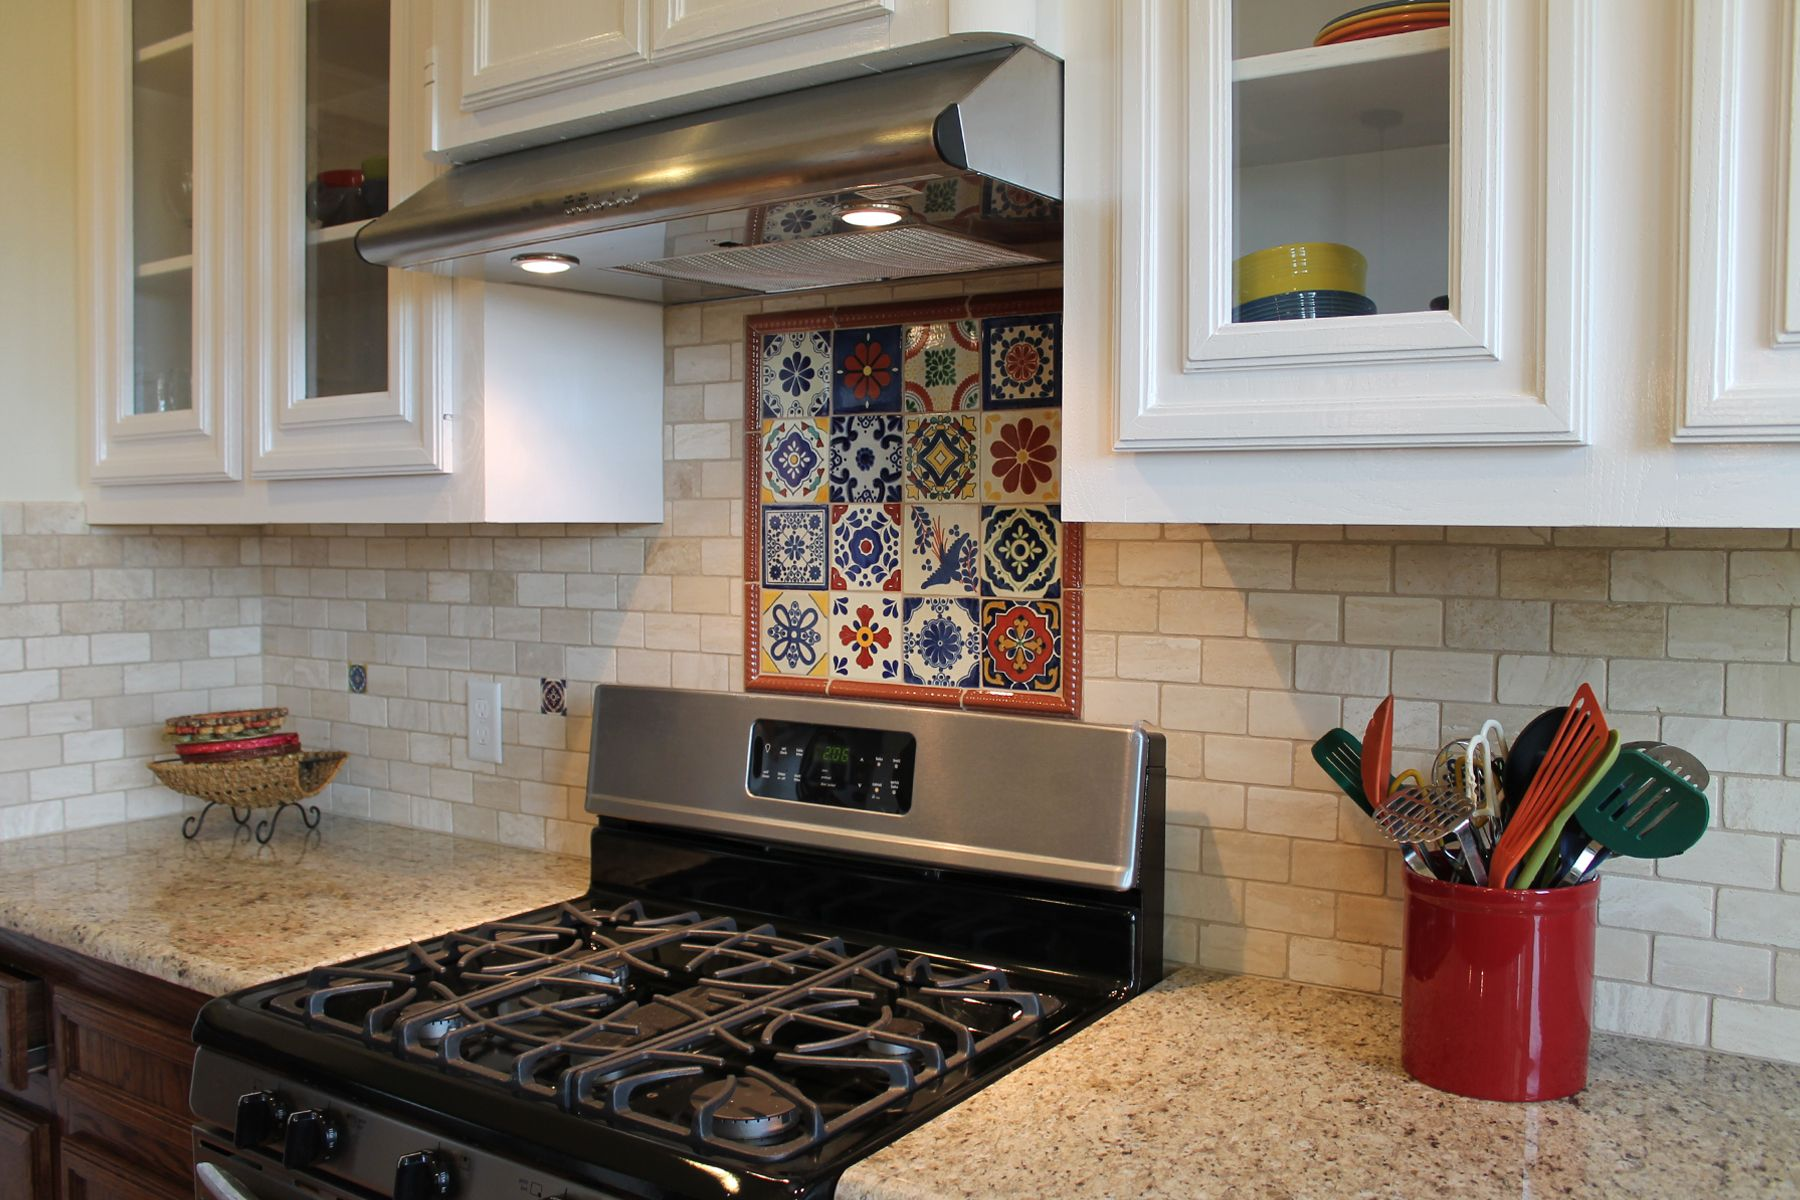 Spanish-style #kitchen backsplash with Talavera tile and ...